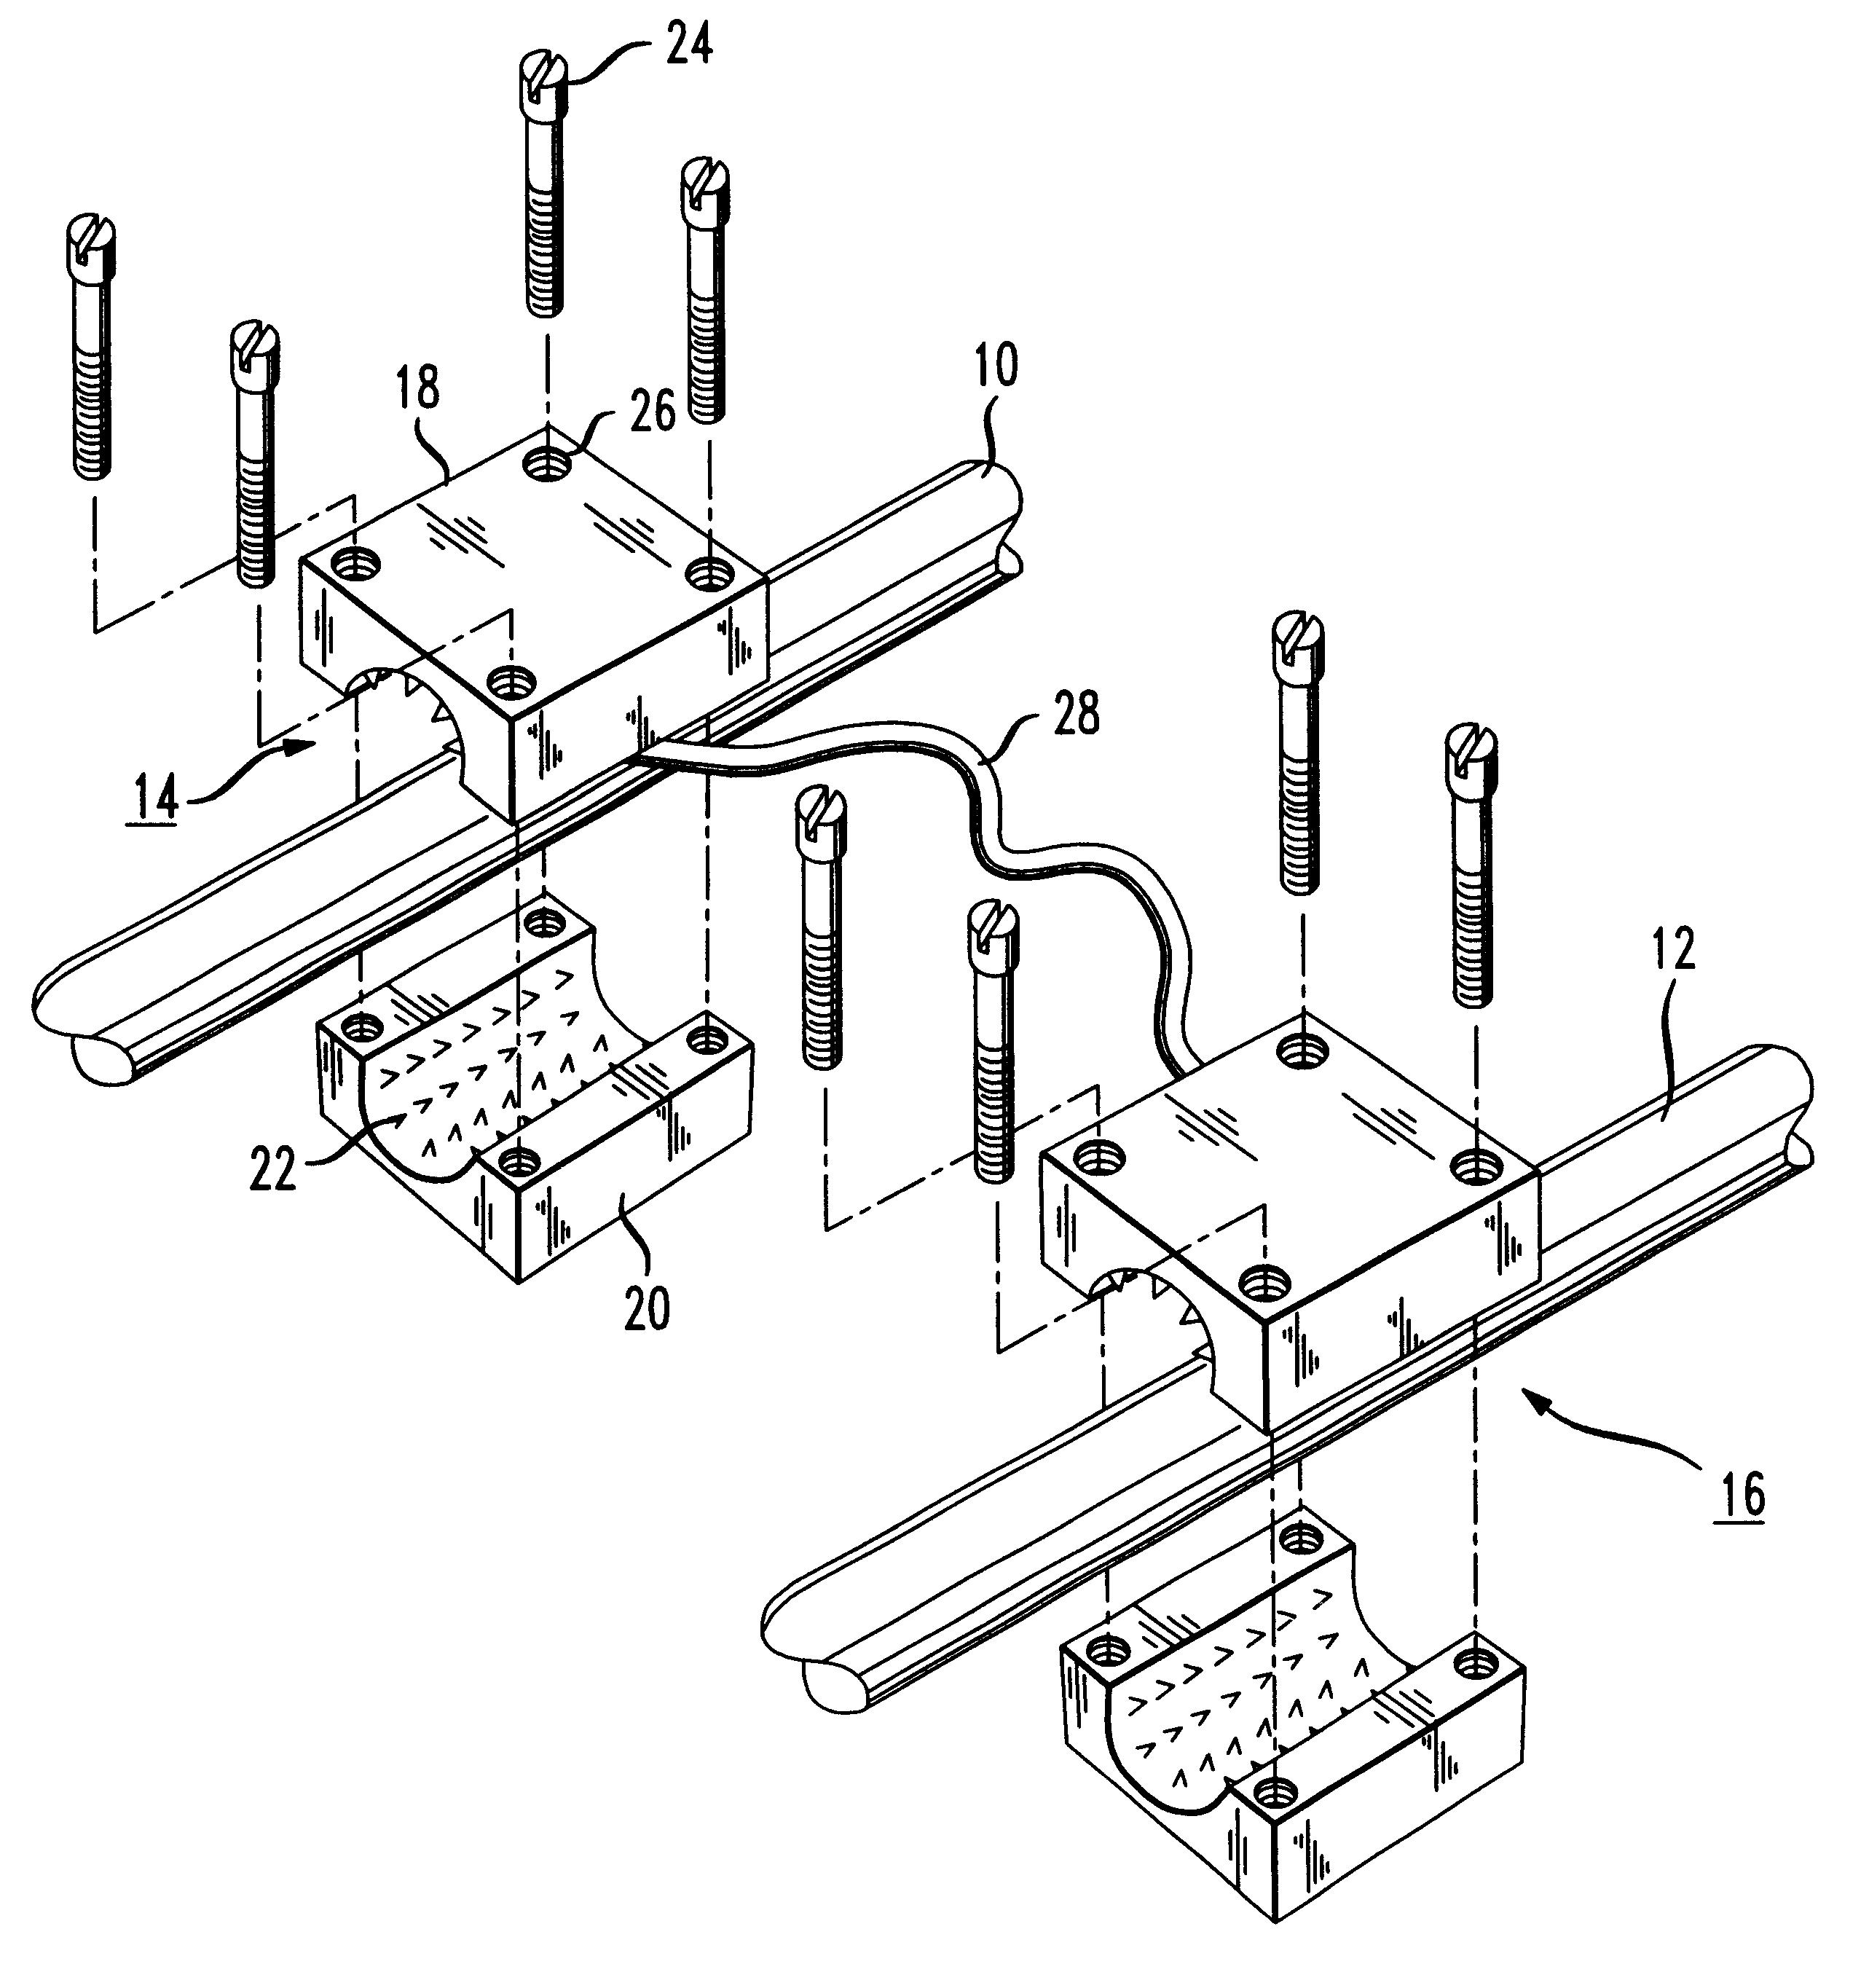 Patent Us6591055 Sheath Bonding Arrangement For Fiber Optic Cable Schematic Drawing